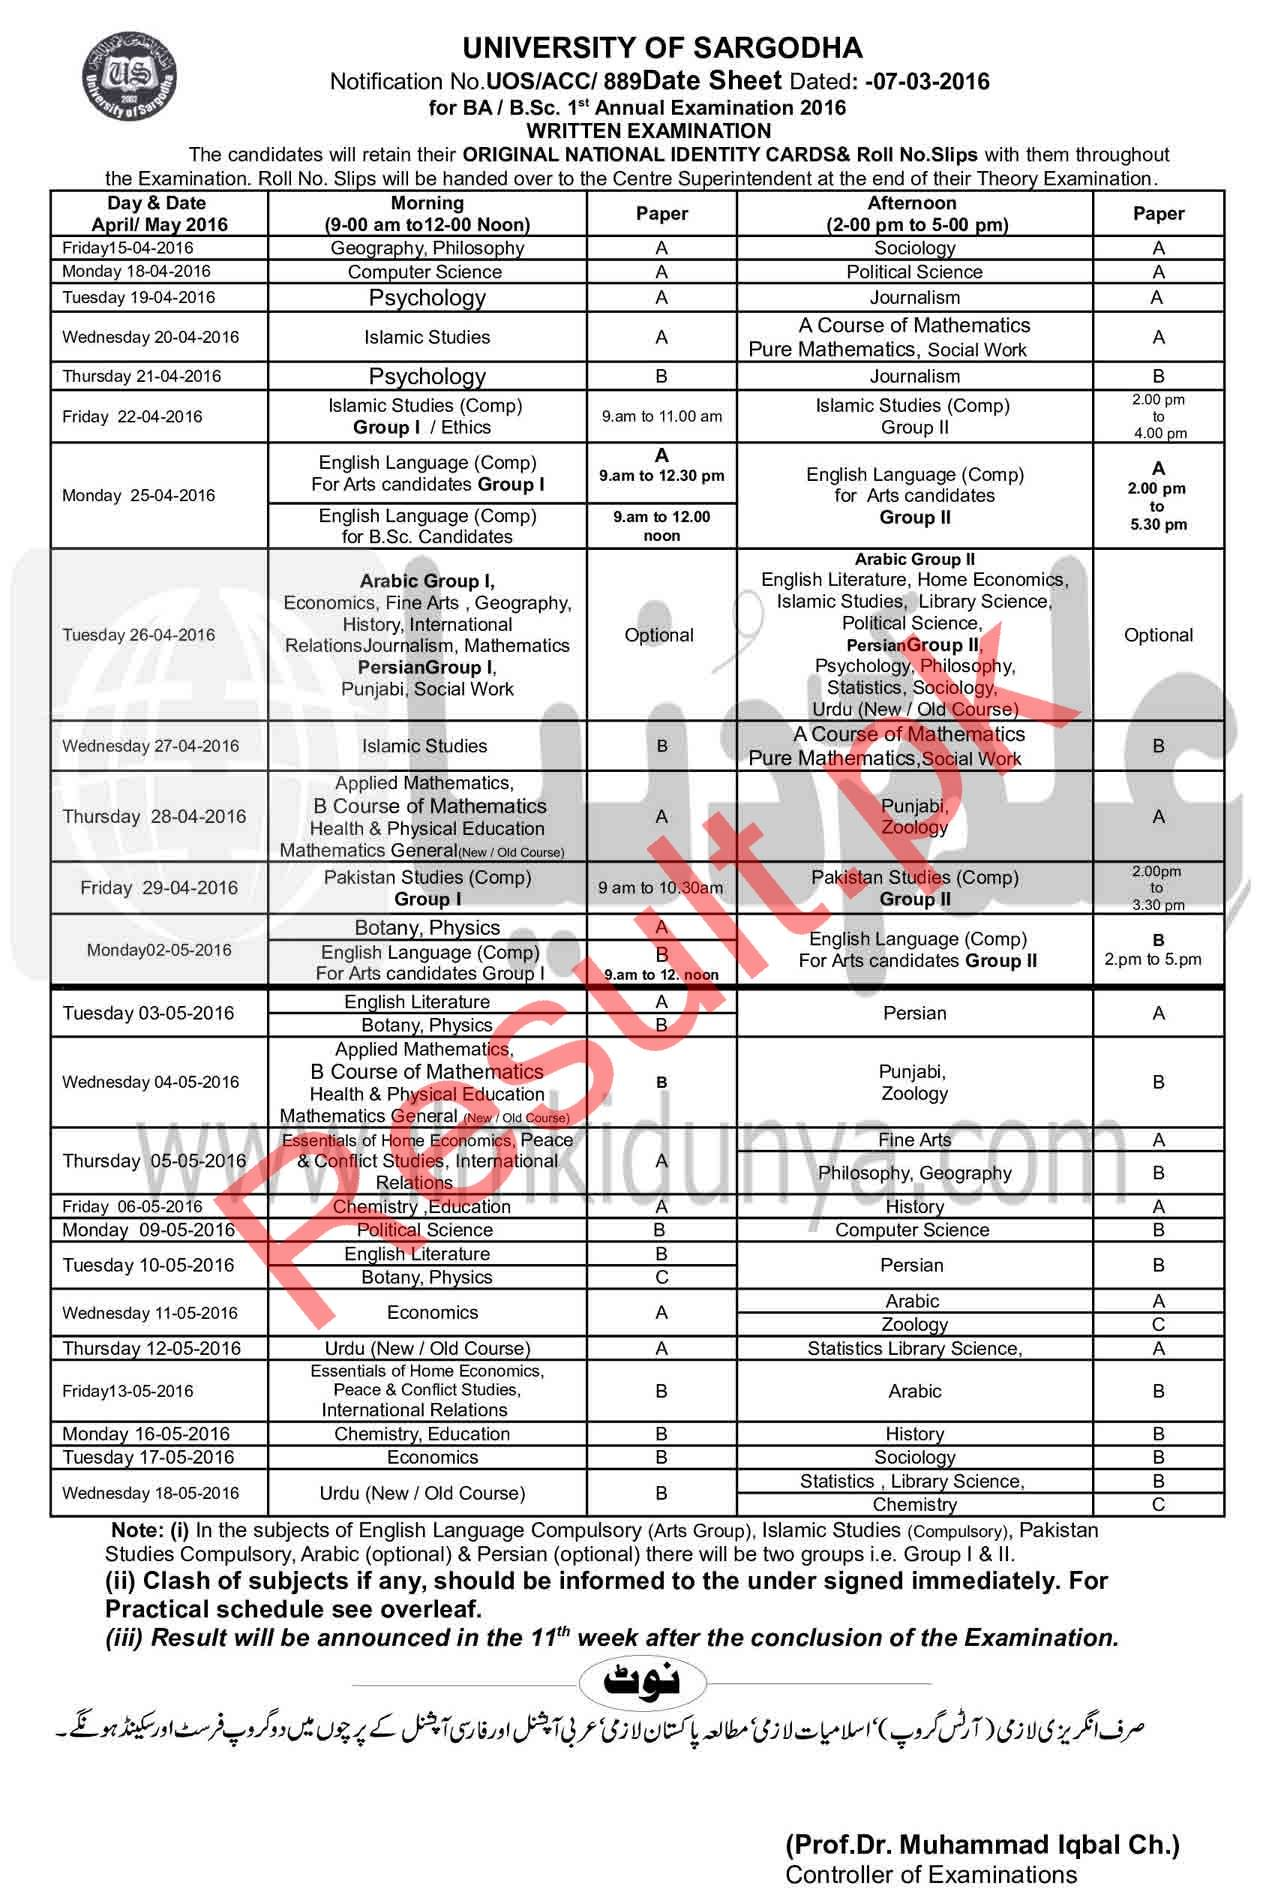 University of Sargodha Date Sheet 2019 uos Annual Supply Exams Time